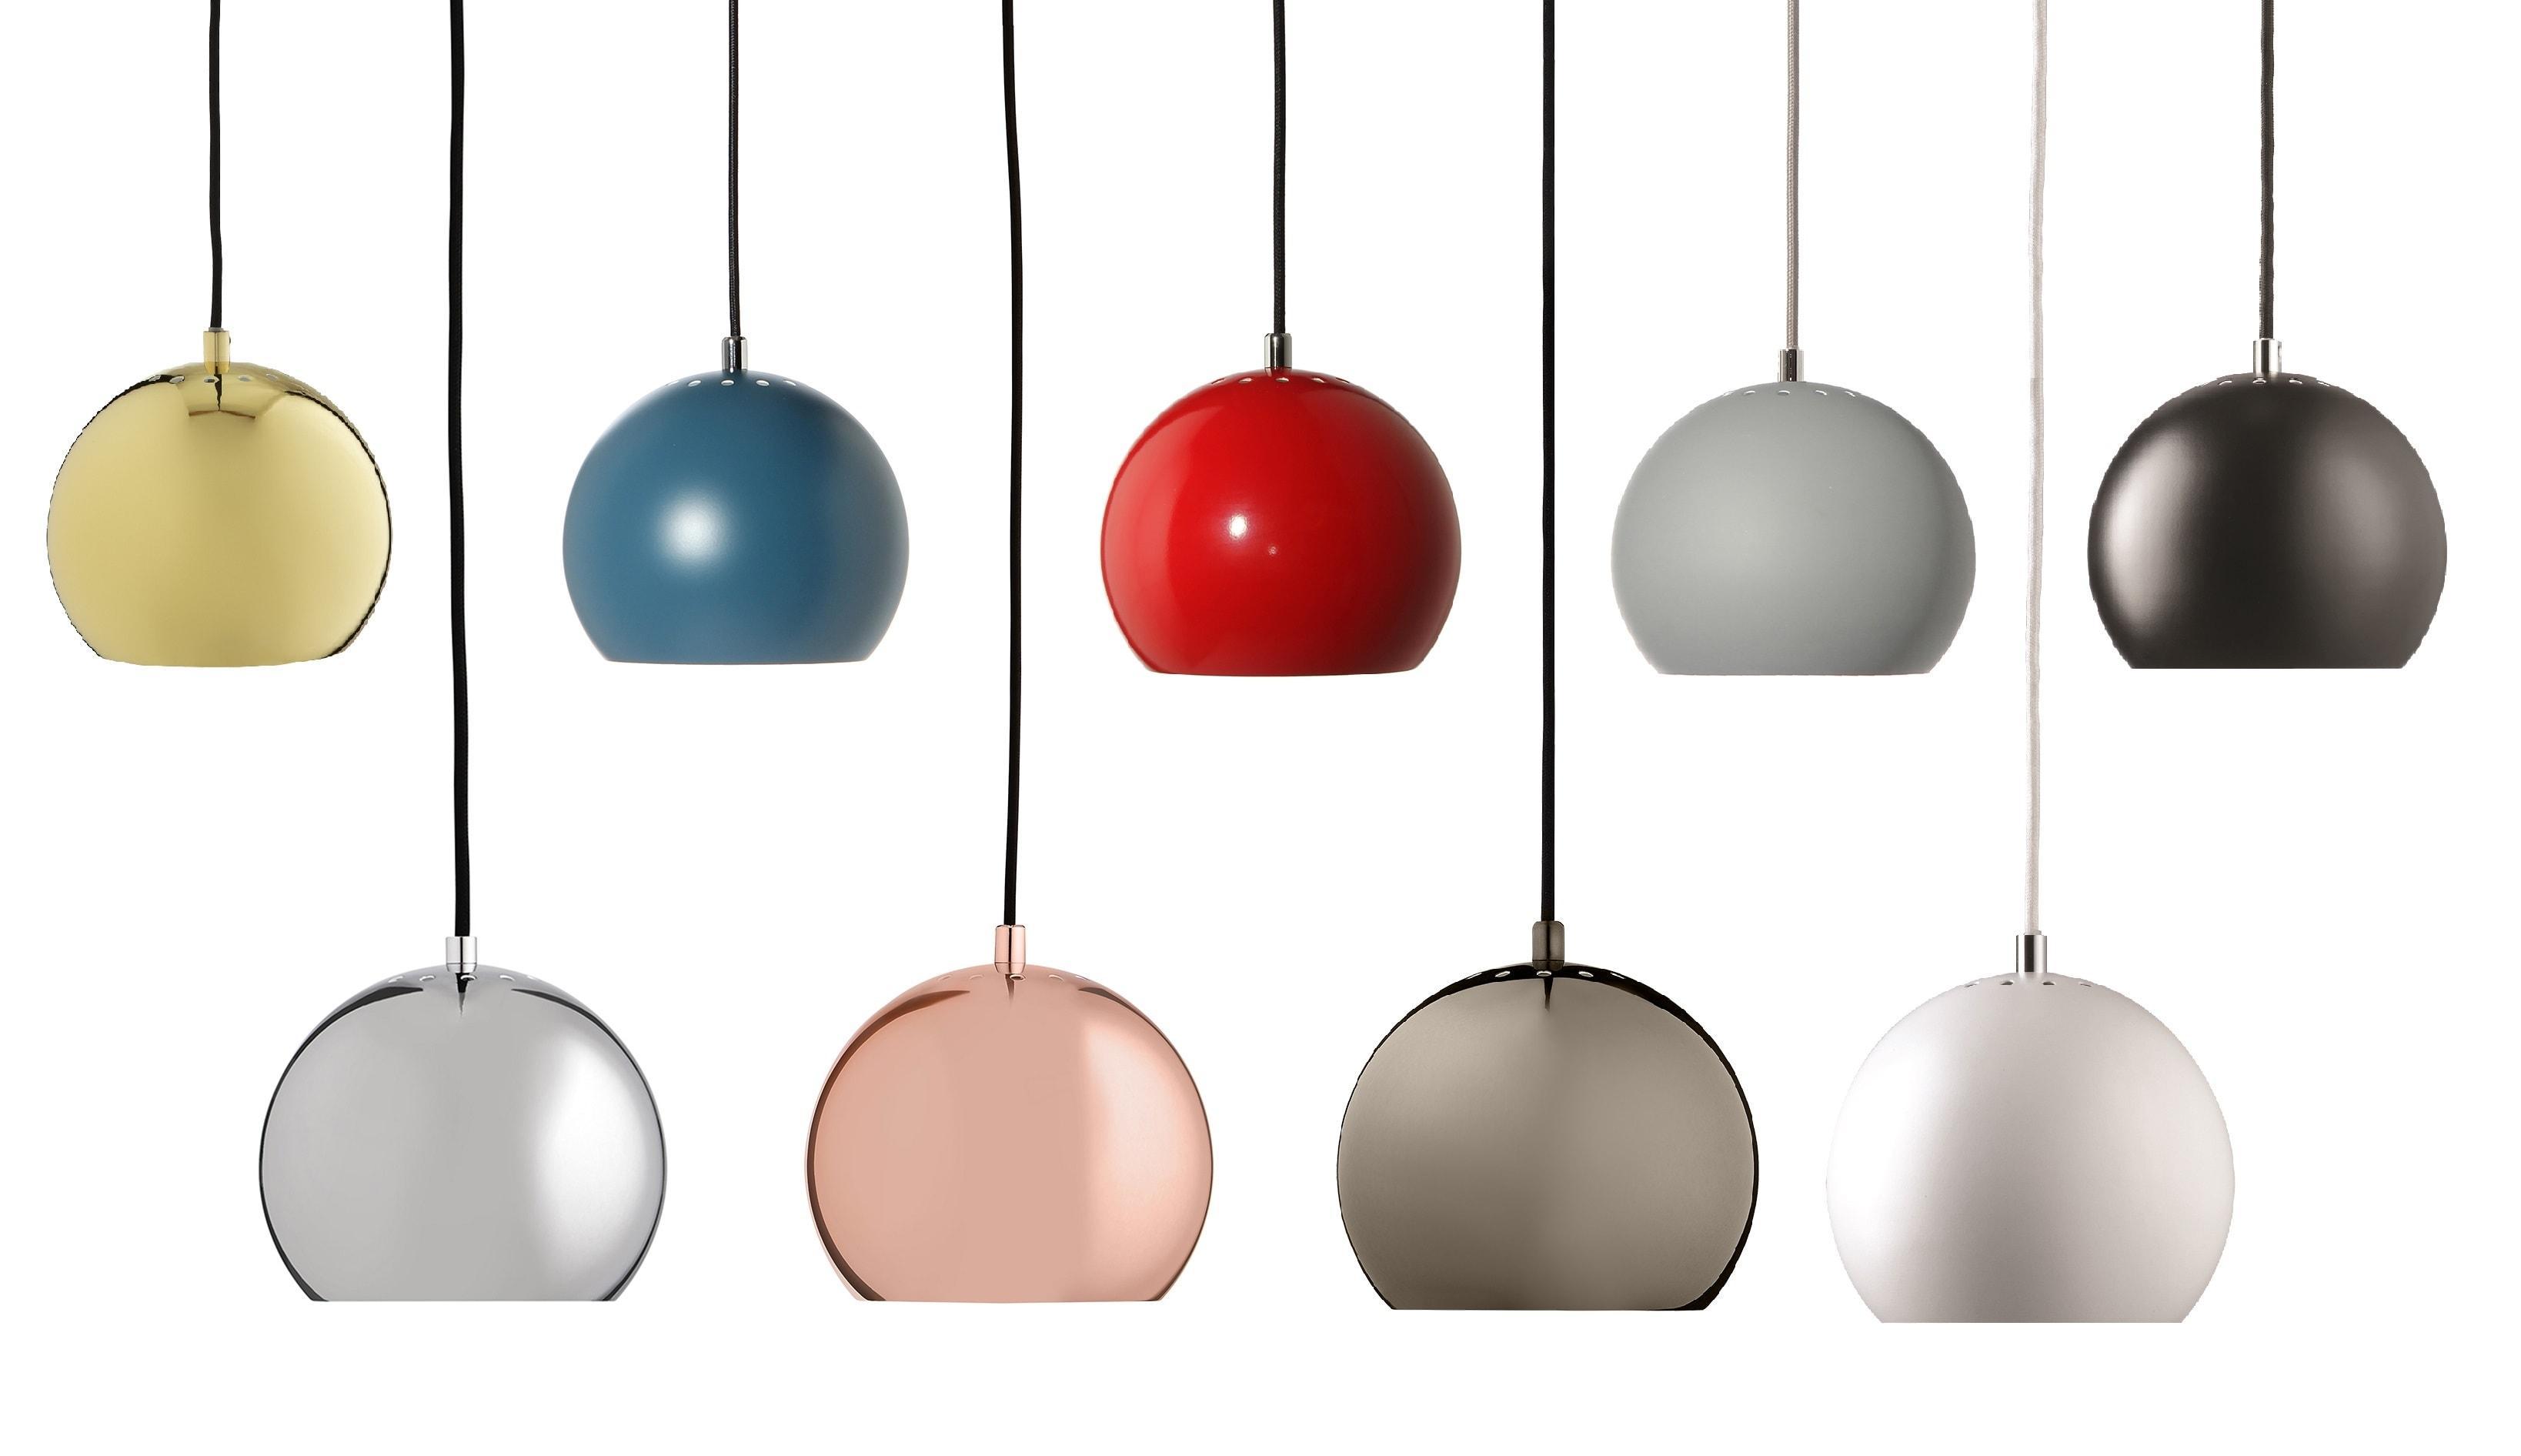 Frandsen Ball Lampe